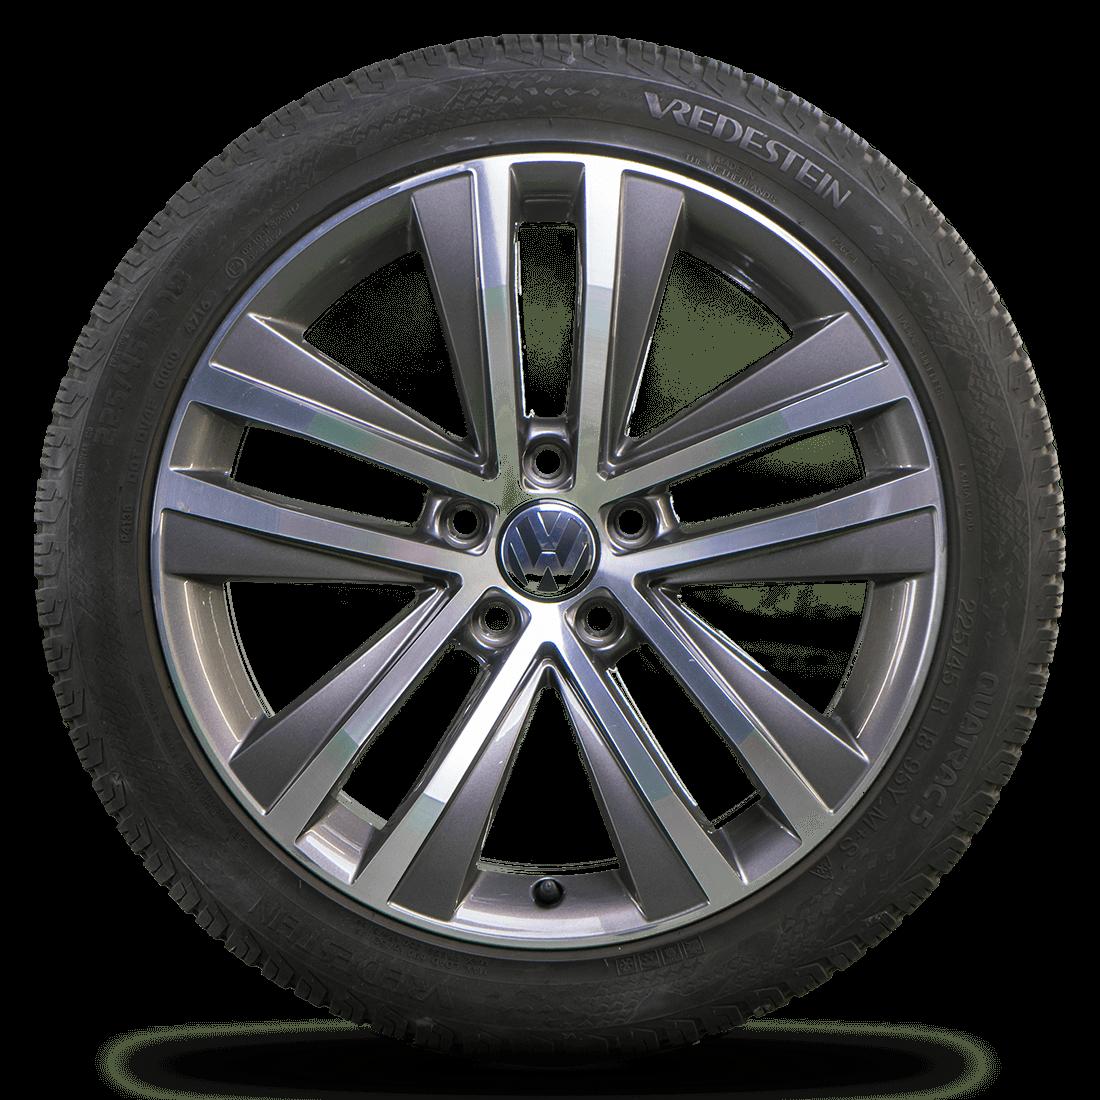 VW Sharan 7N Seat Alhambra 18 Zoll Ganzjahresreifen Allwetterreifen Toulon Akira